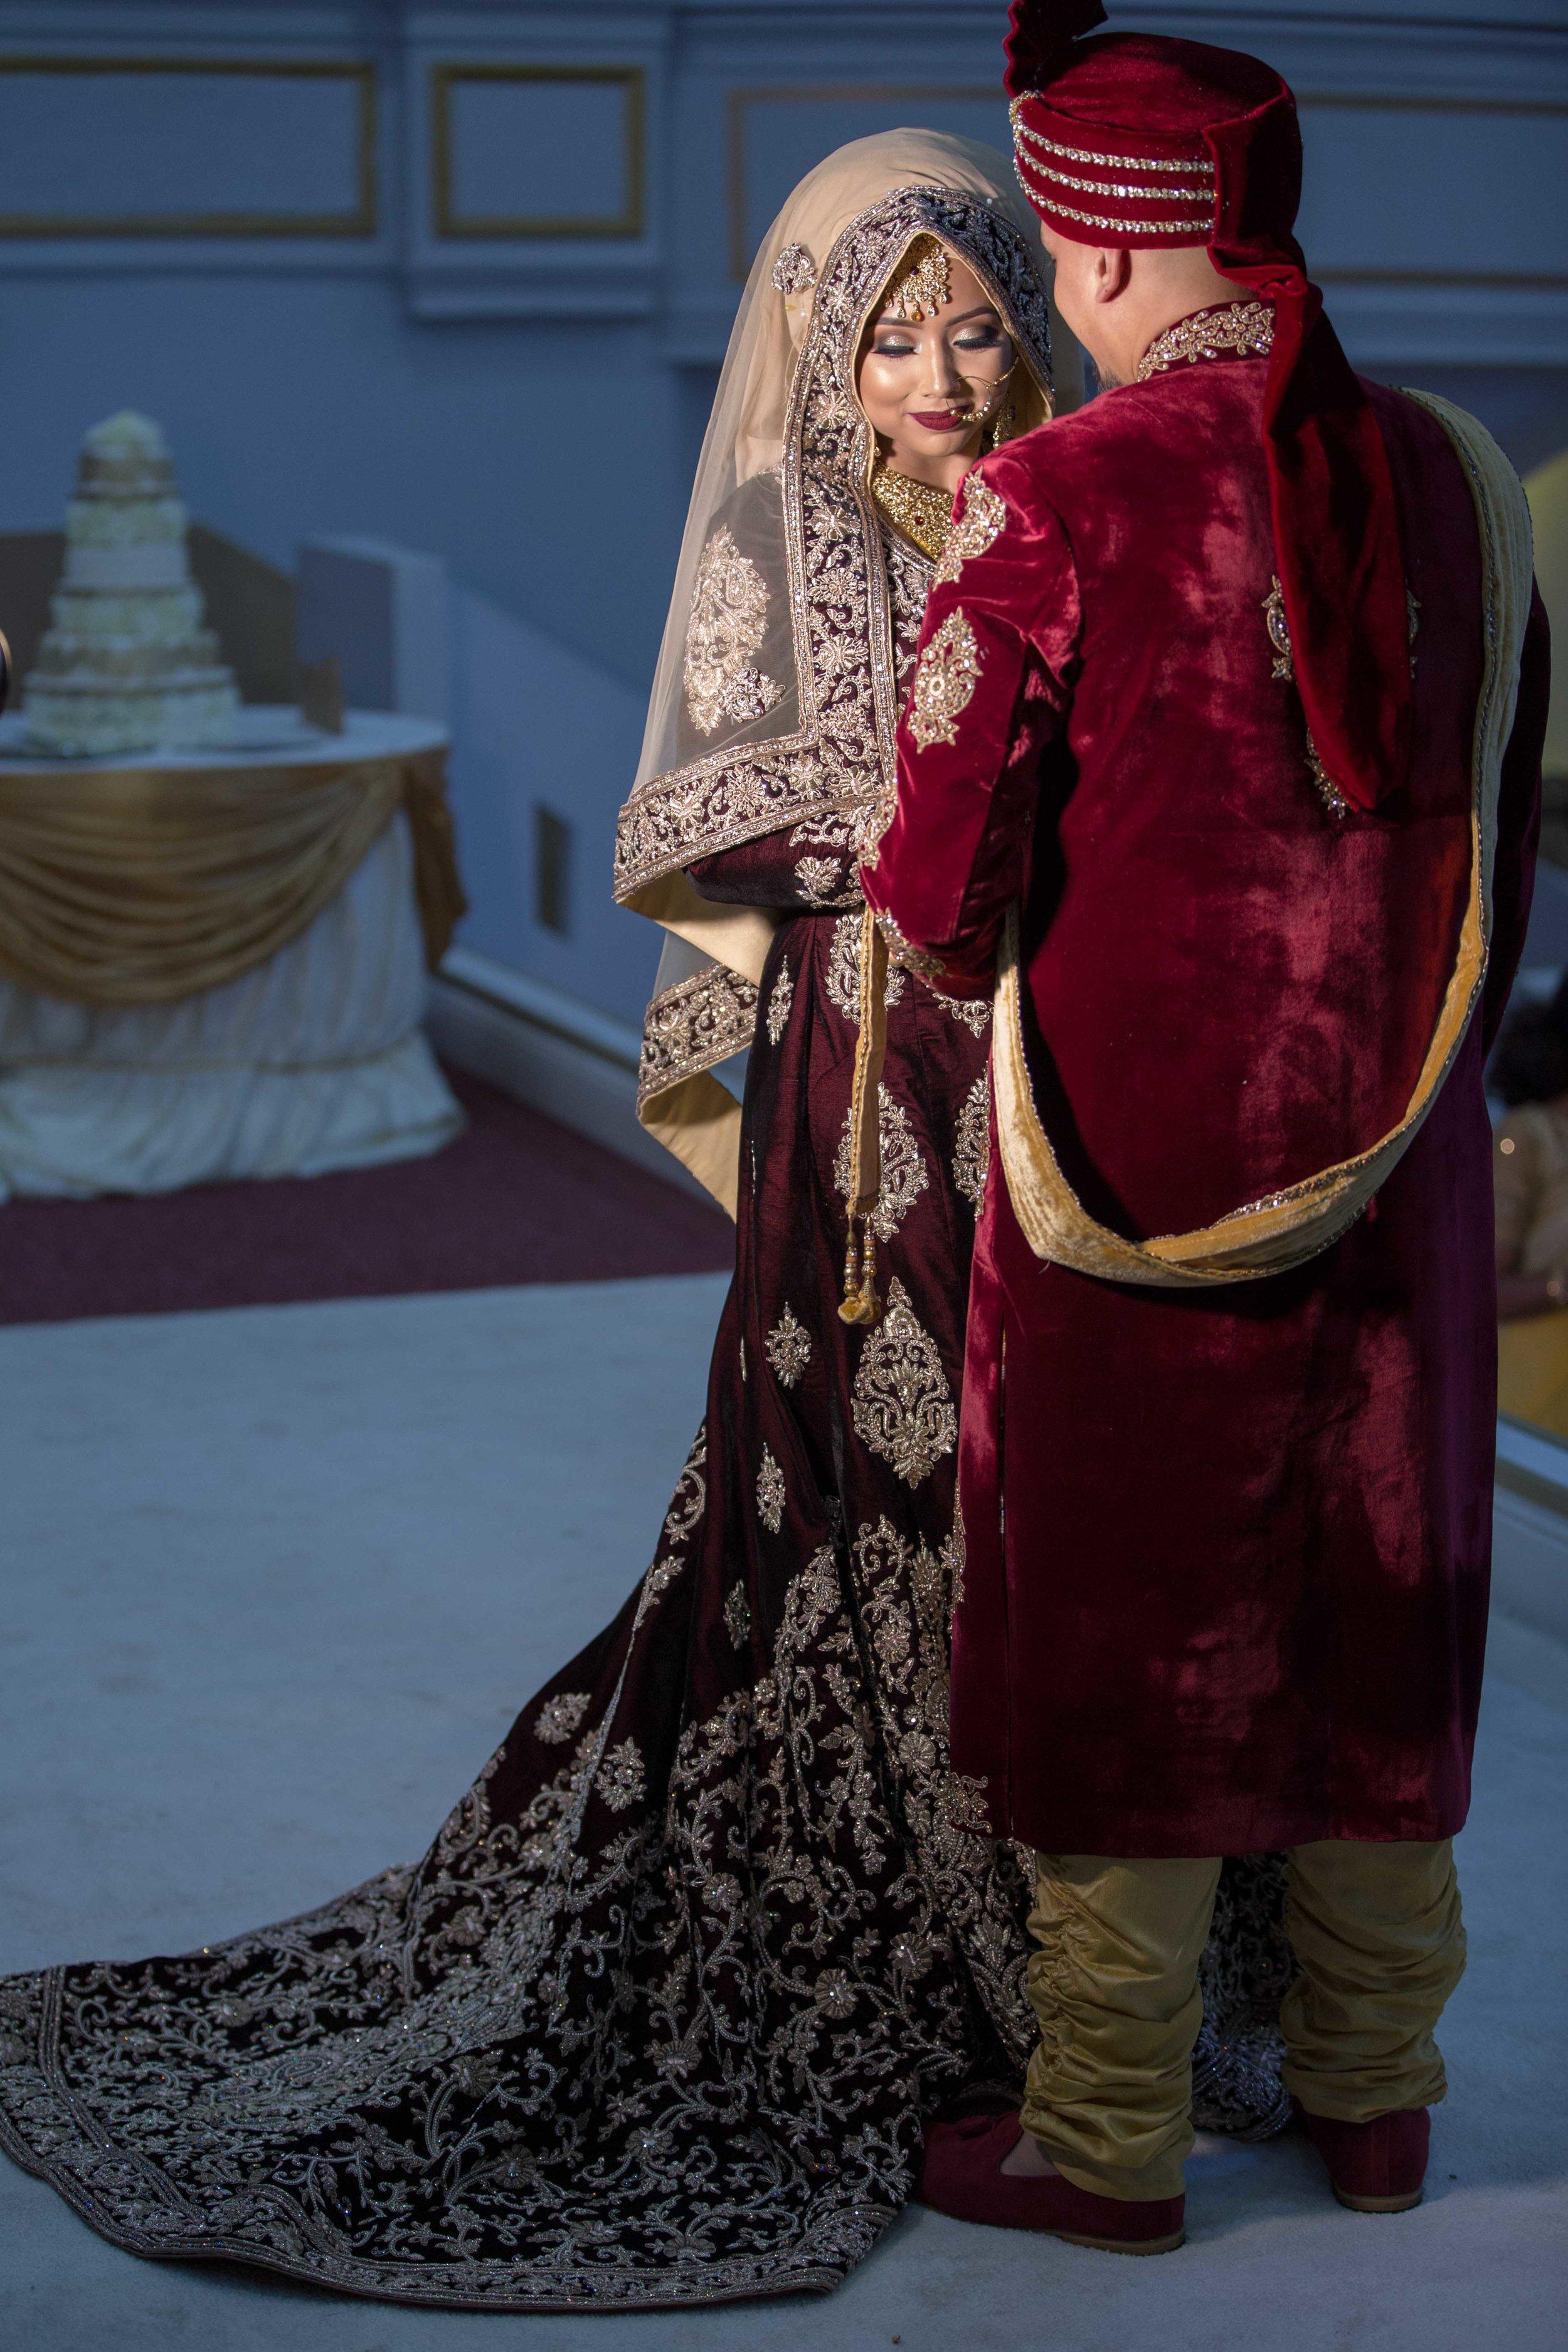 Female-Asian-Piccadilly-banqueting-suite-Wedding-Photographer-Birmingham-natalia-smith-photography-22.jpg